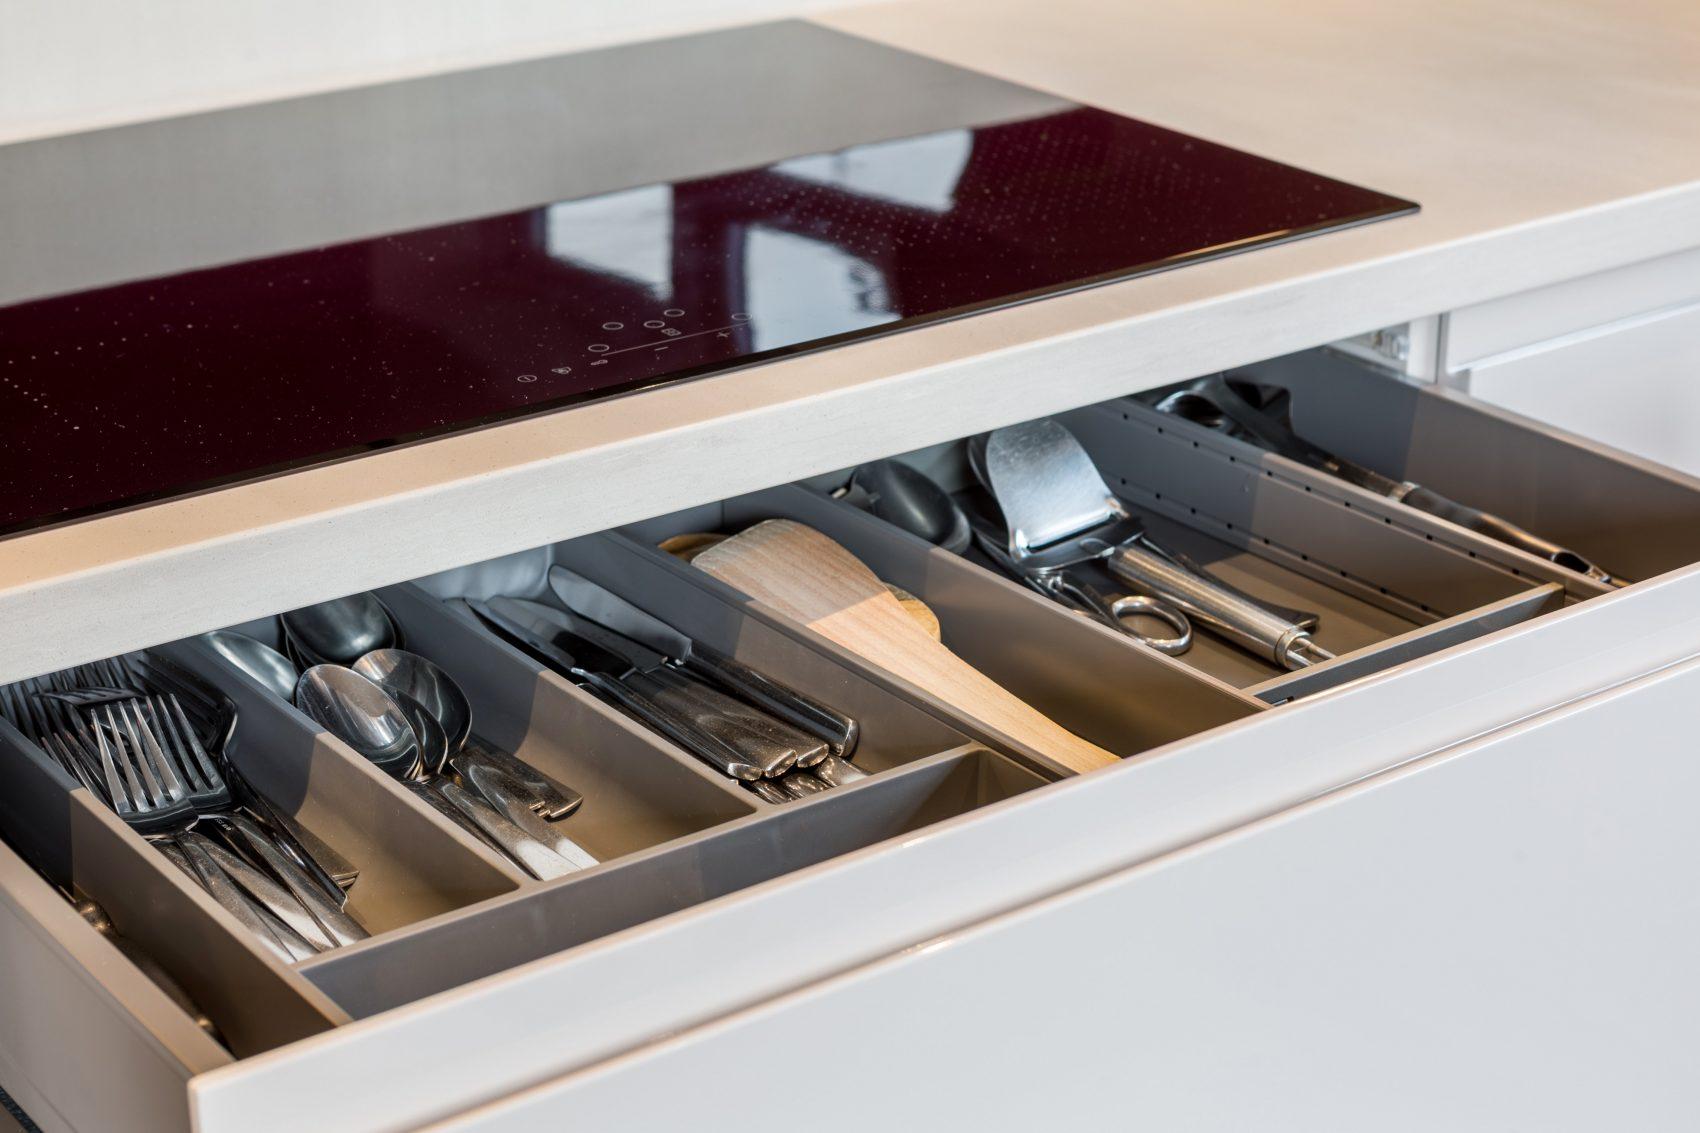 cutlery drawer insert